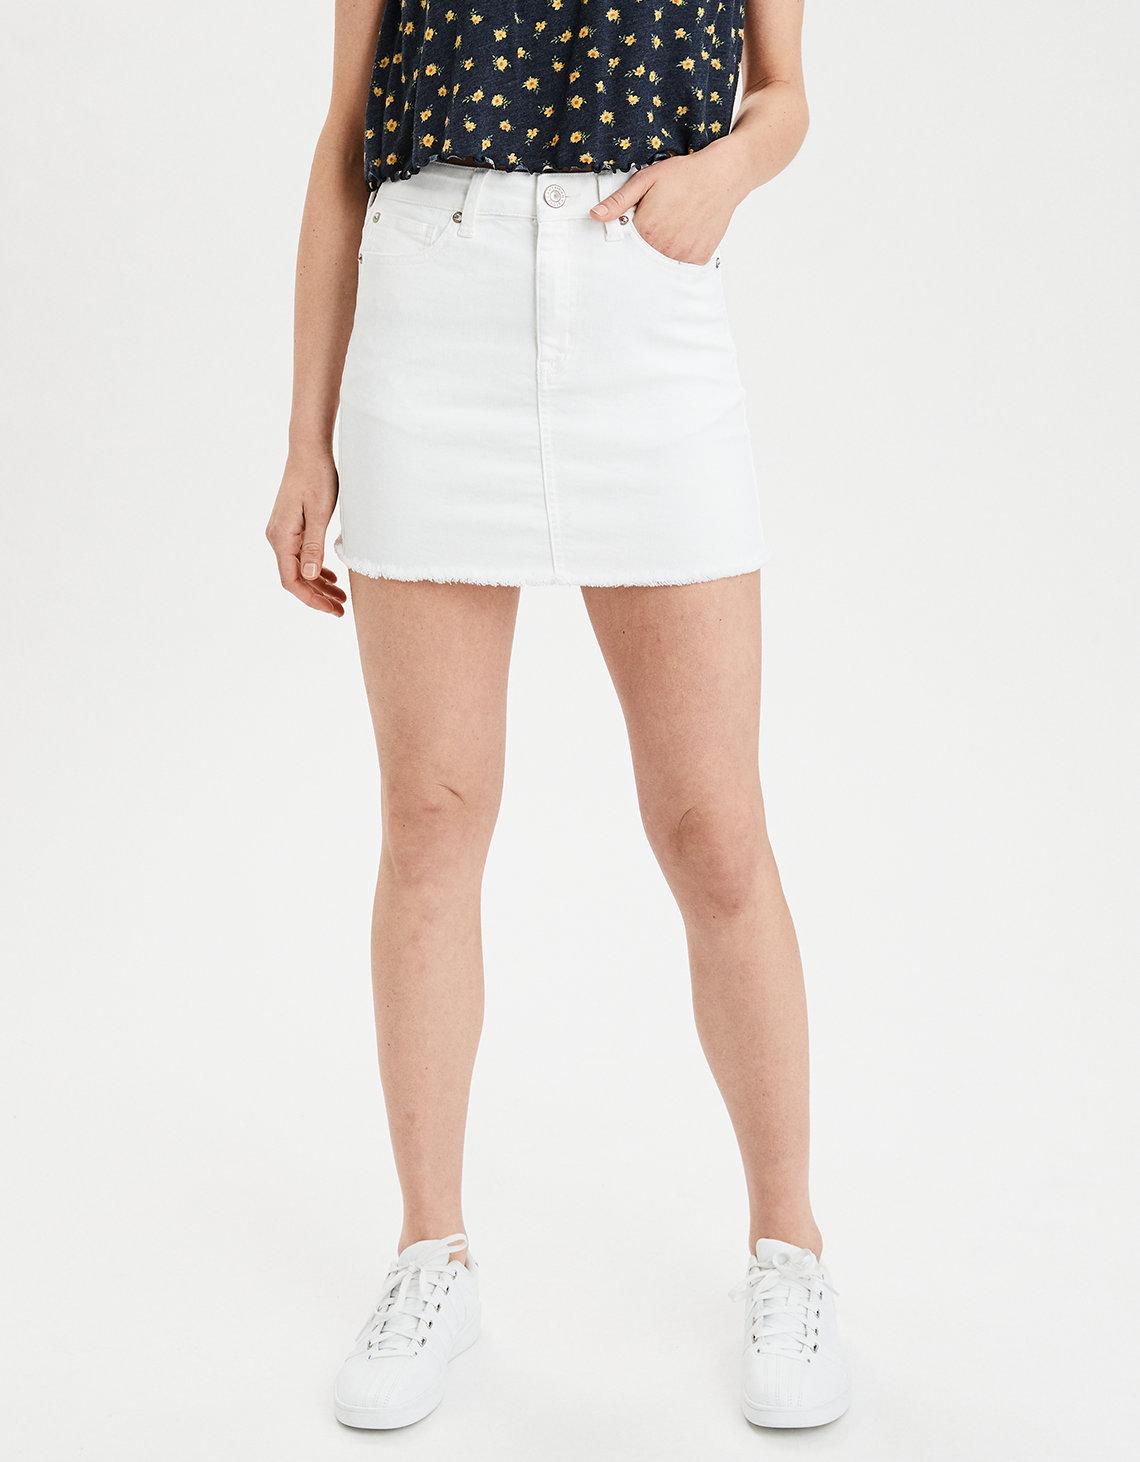 68c3d63eb27 High-Waisted Denim Mini Skirt. Placeholder image. Product Image